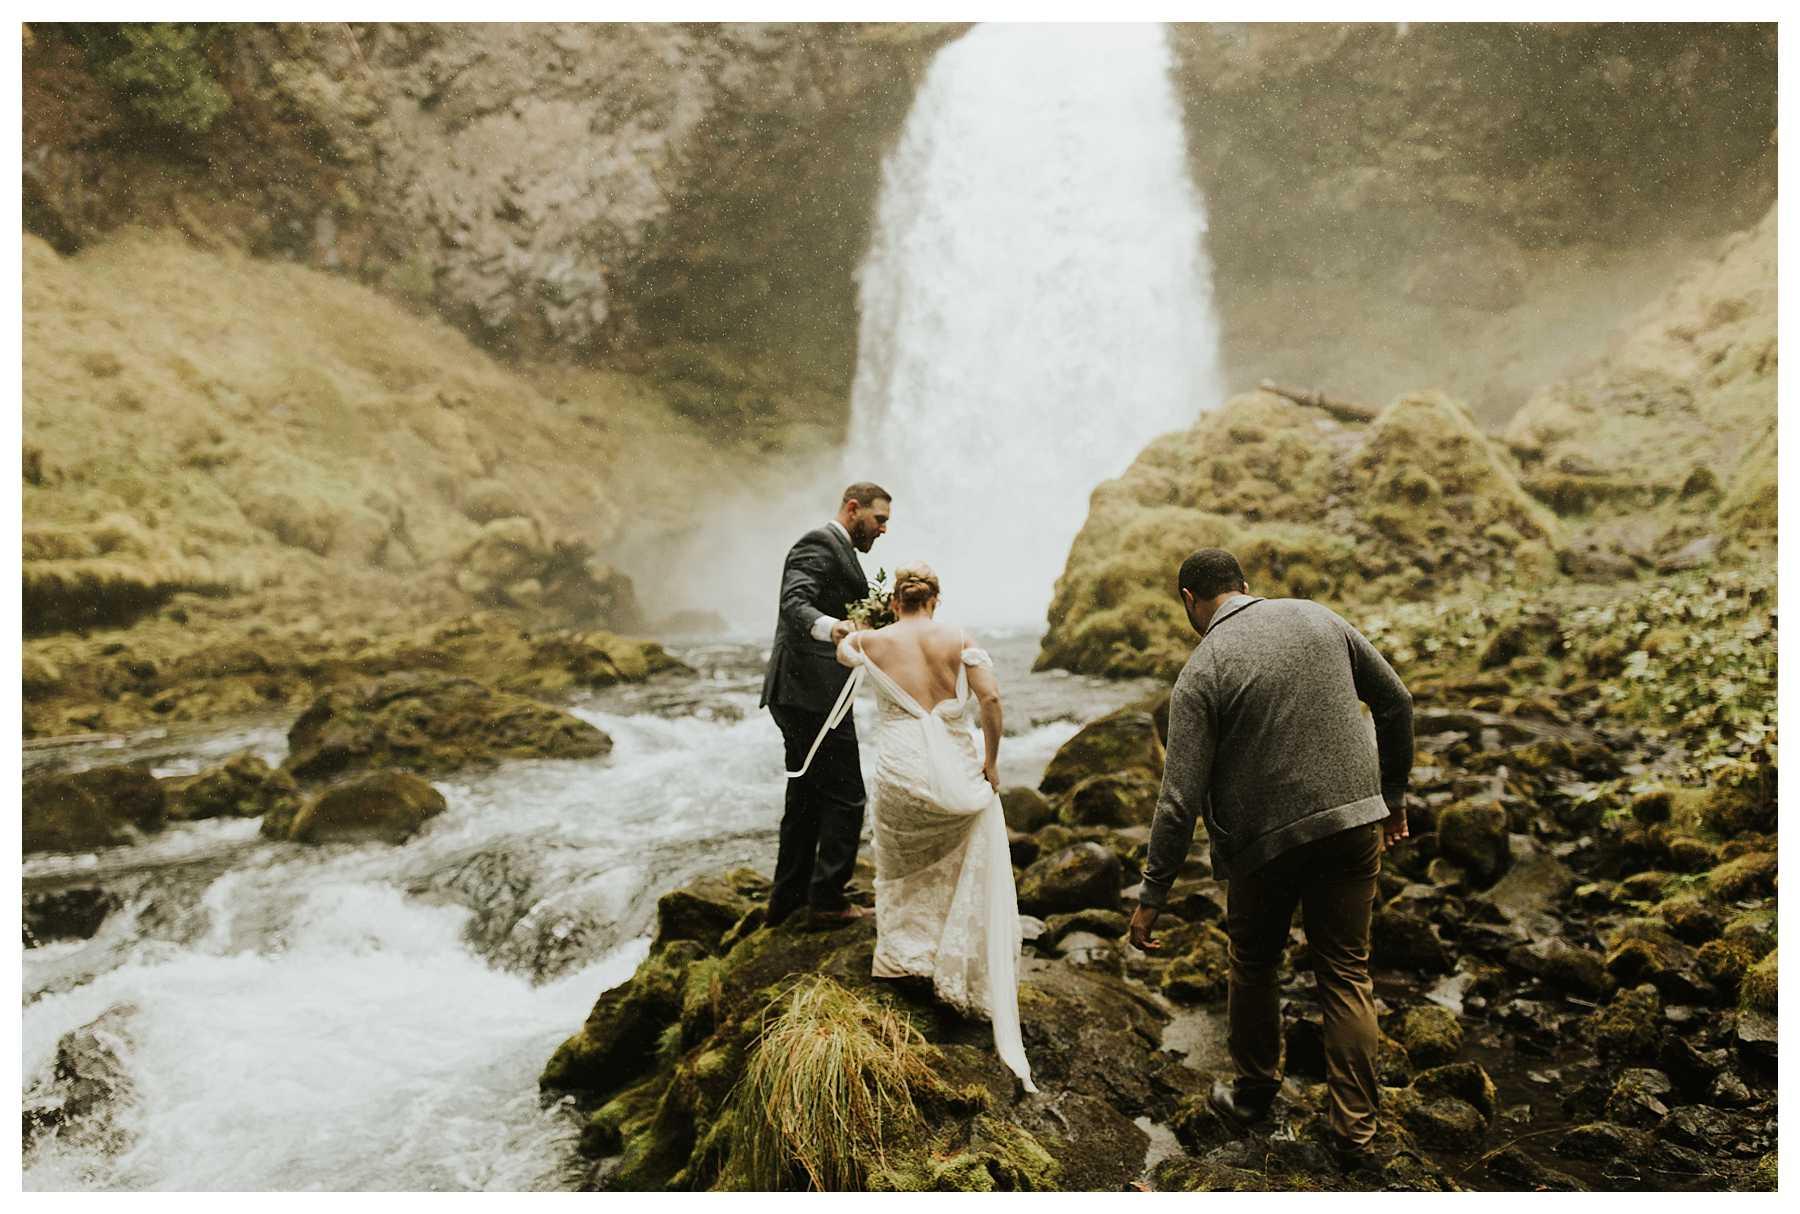 Oregon_Waterfall_Elopement_0014.jpg